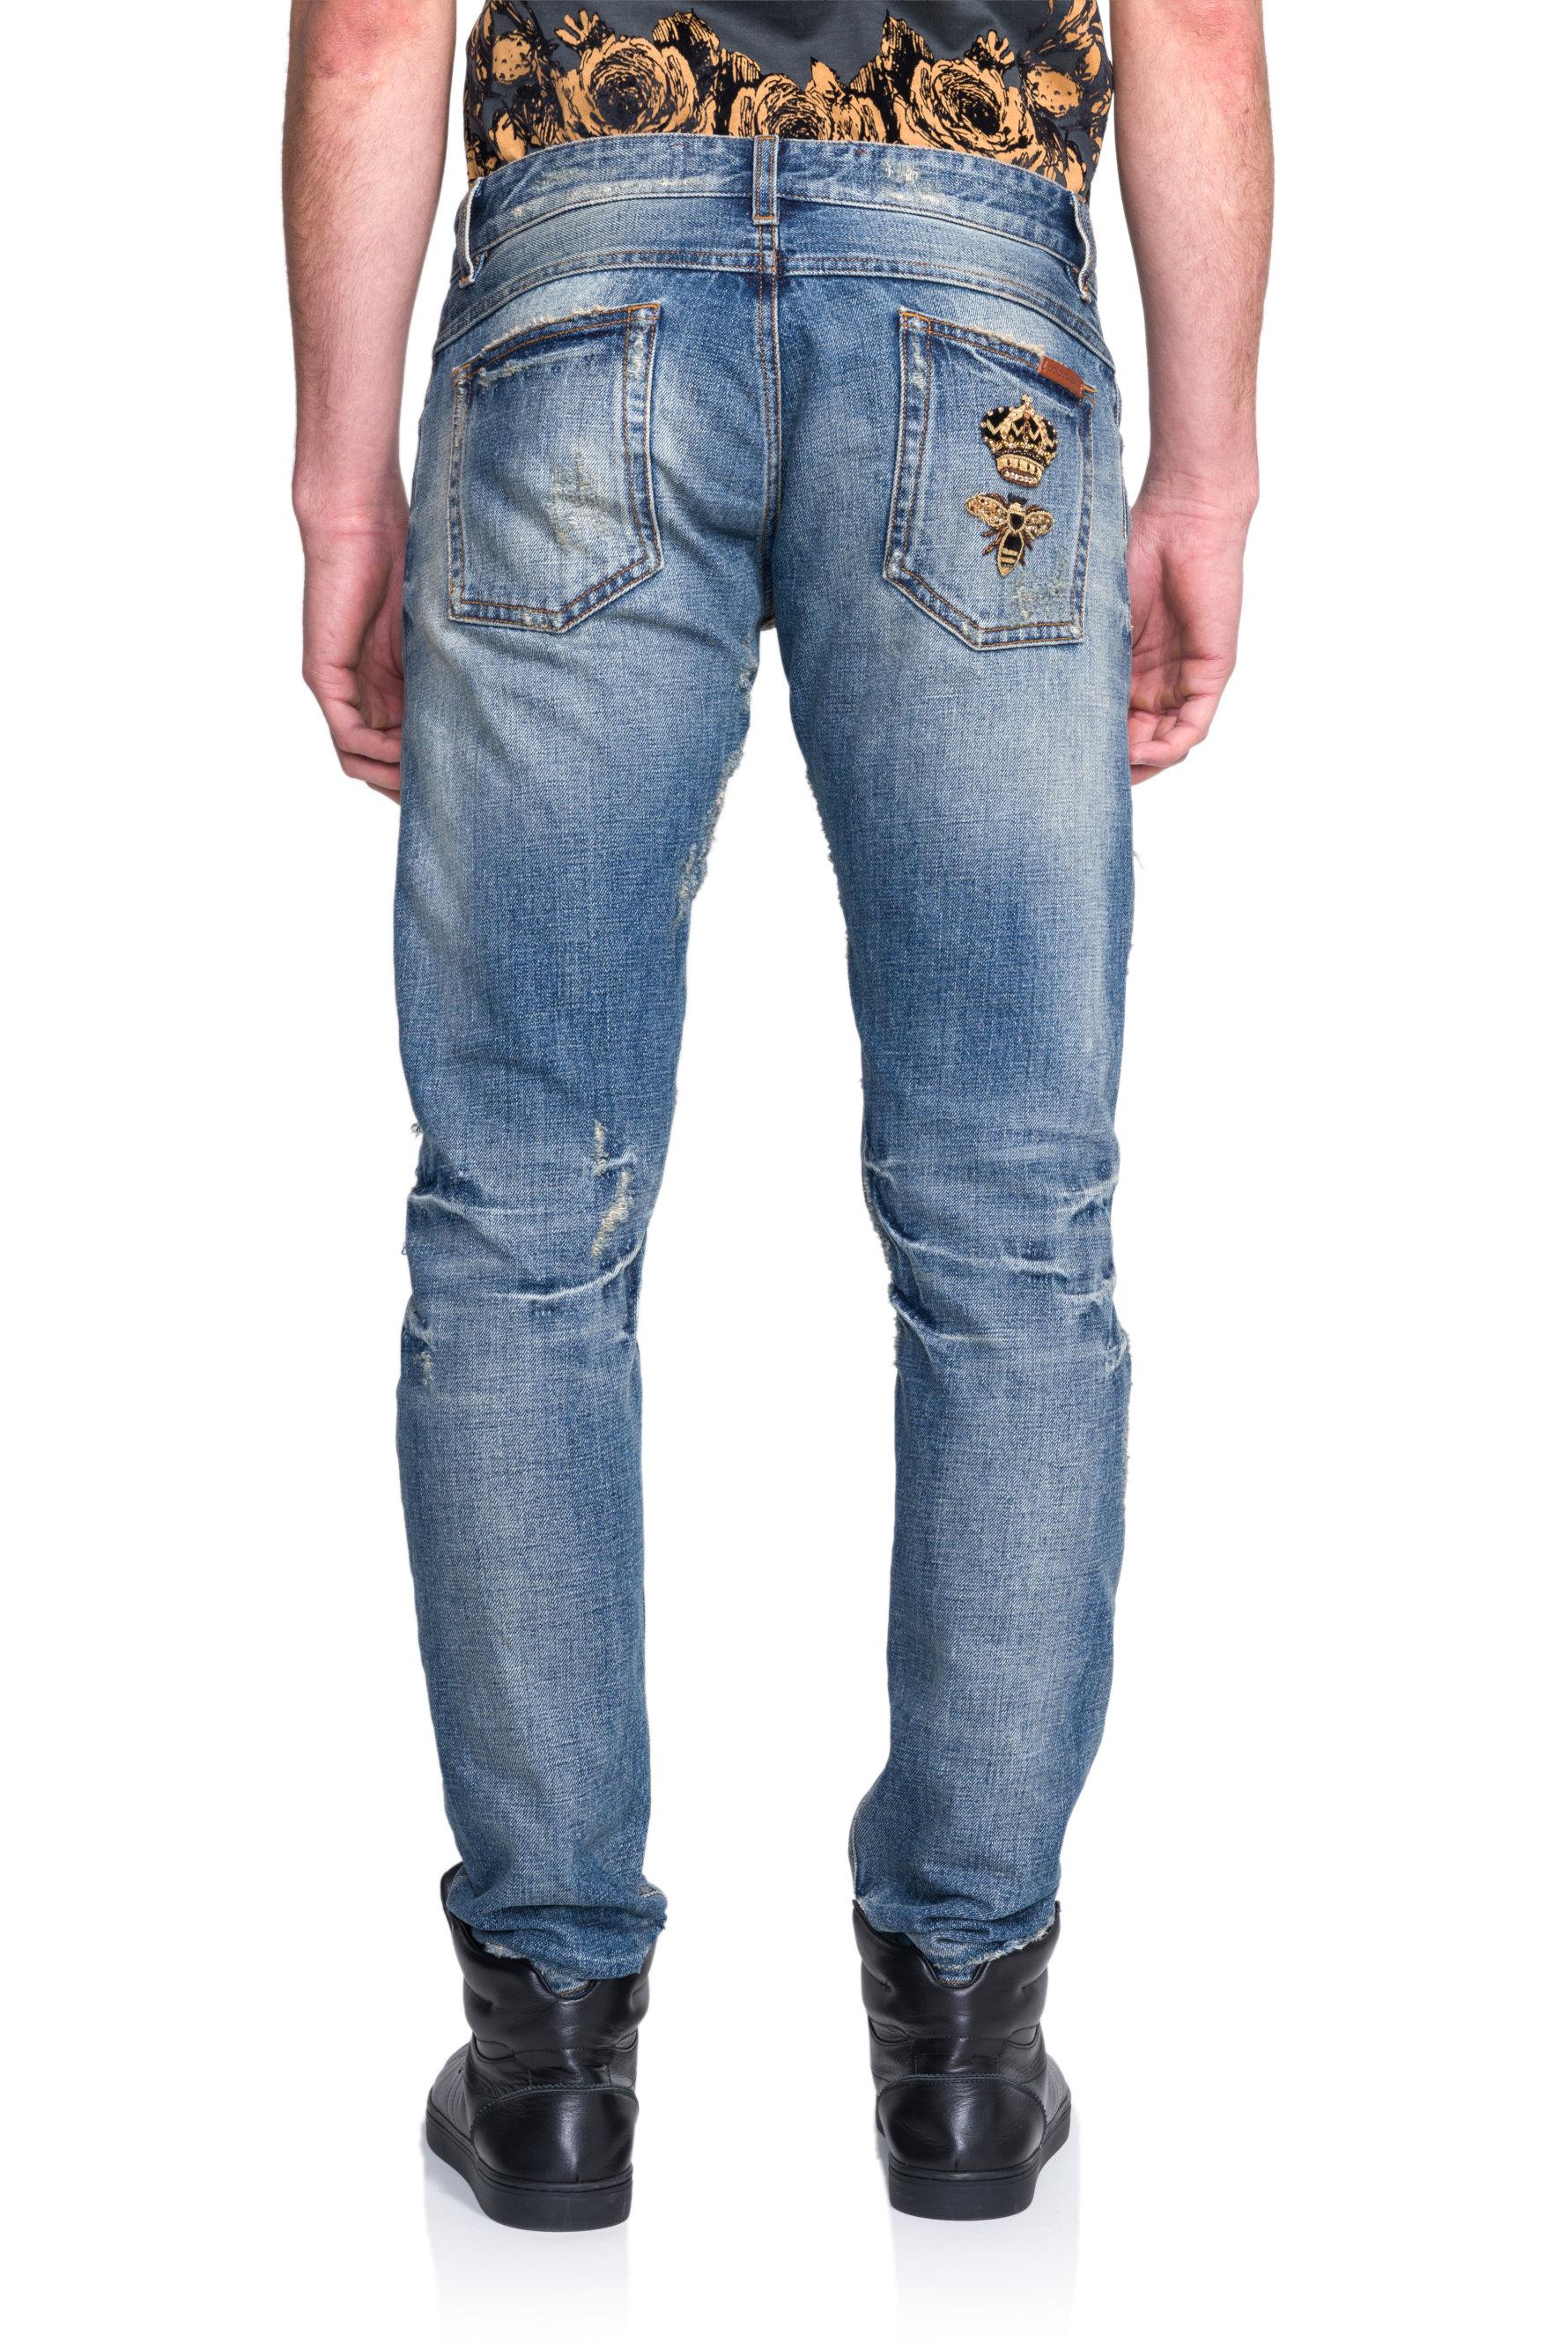 dolce gabbana distressed crown patch denim jeans in blue. Black Bedroom Furniture Sets. Home Design Ideas